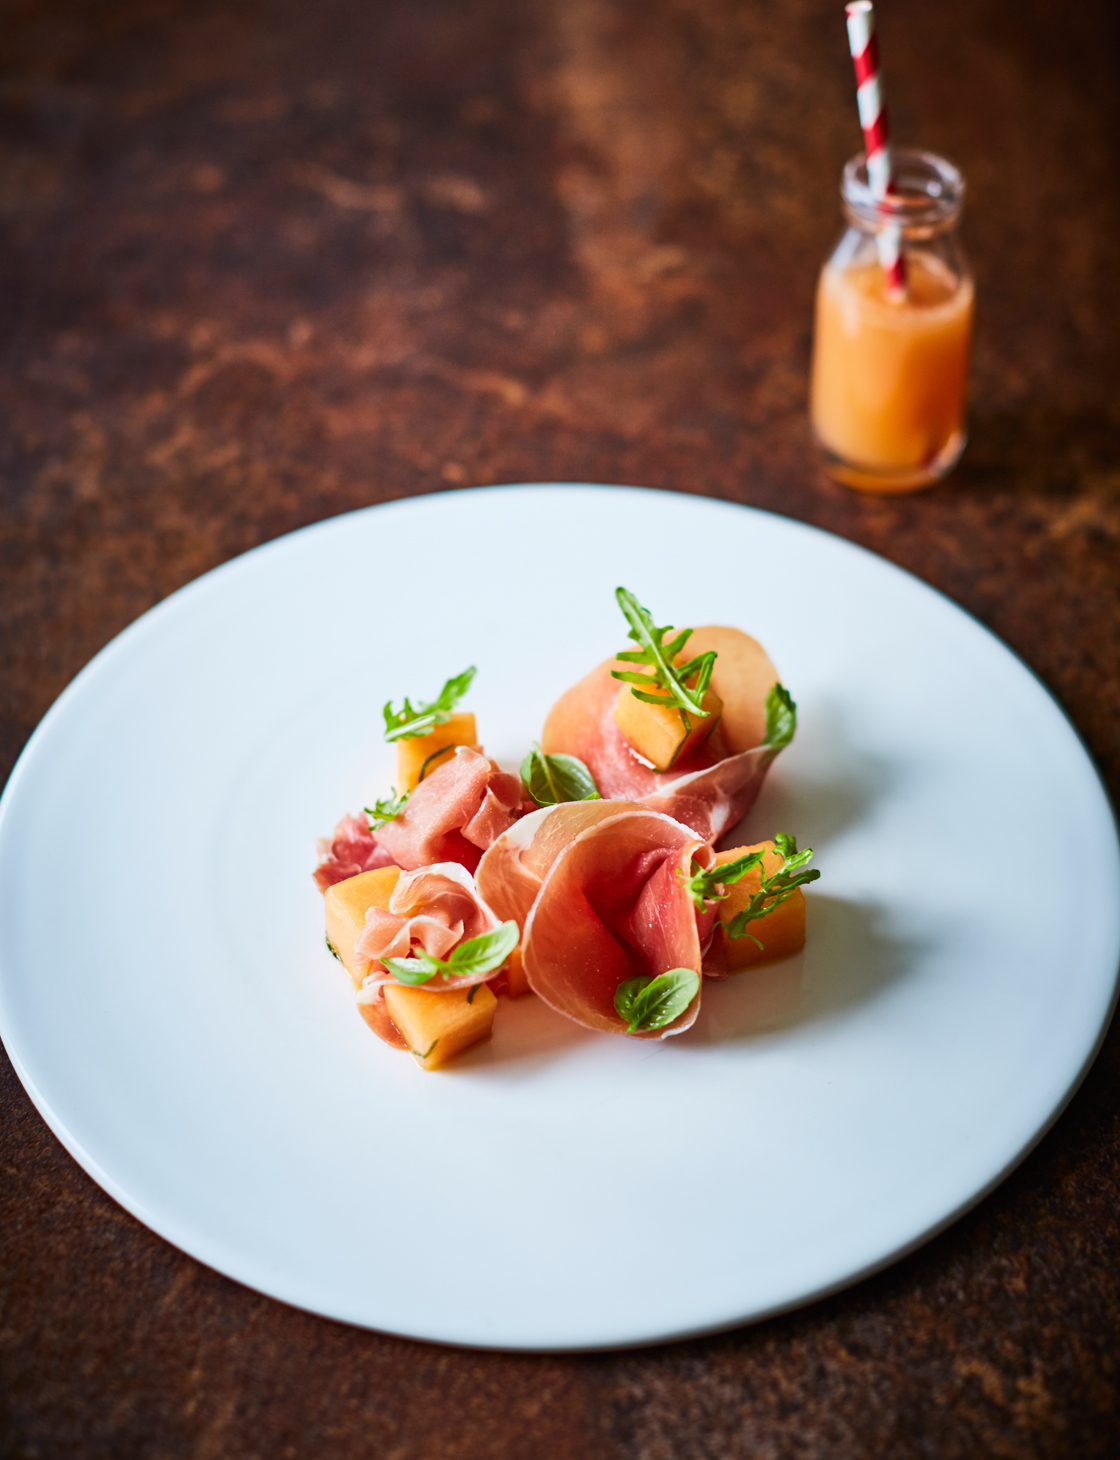 Serrano Ham And Basil Infused Melon Recipe Sainsbury S Magazine